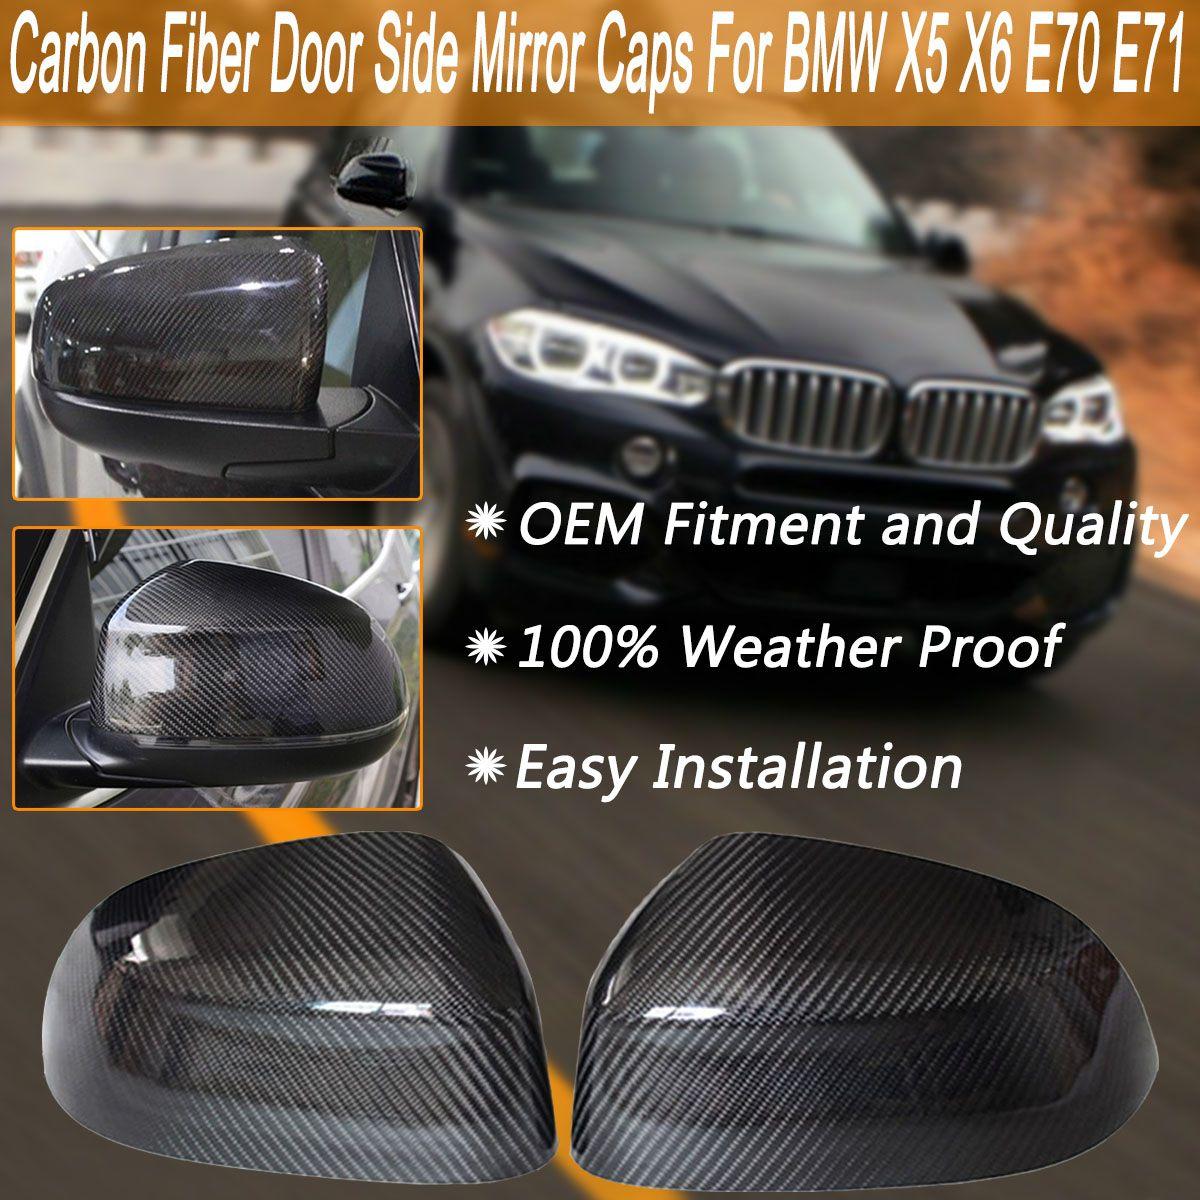 2Pcs Carbon Fiber Rear Door Side Wing Mirror Black Covers Cover Caps For BMW X5 X6